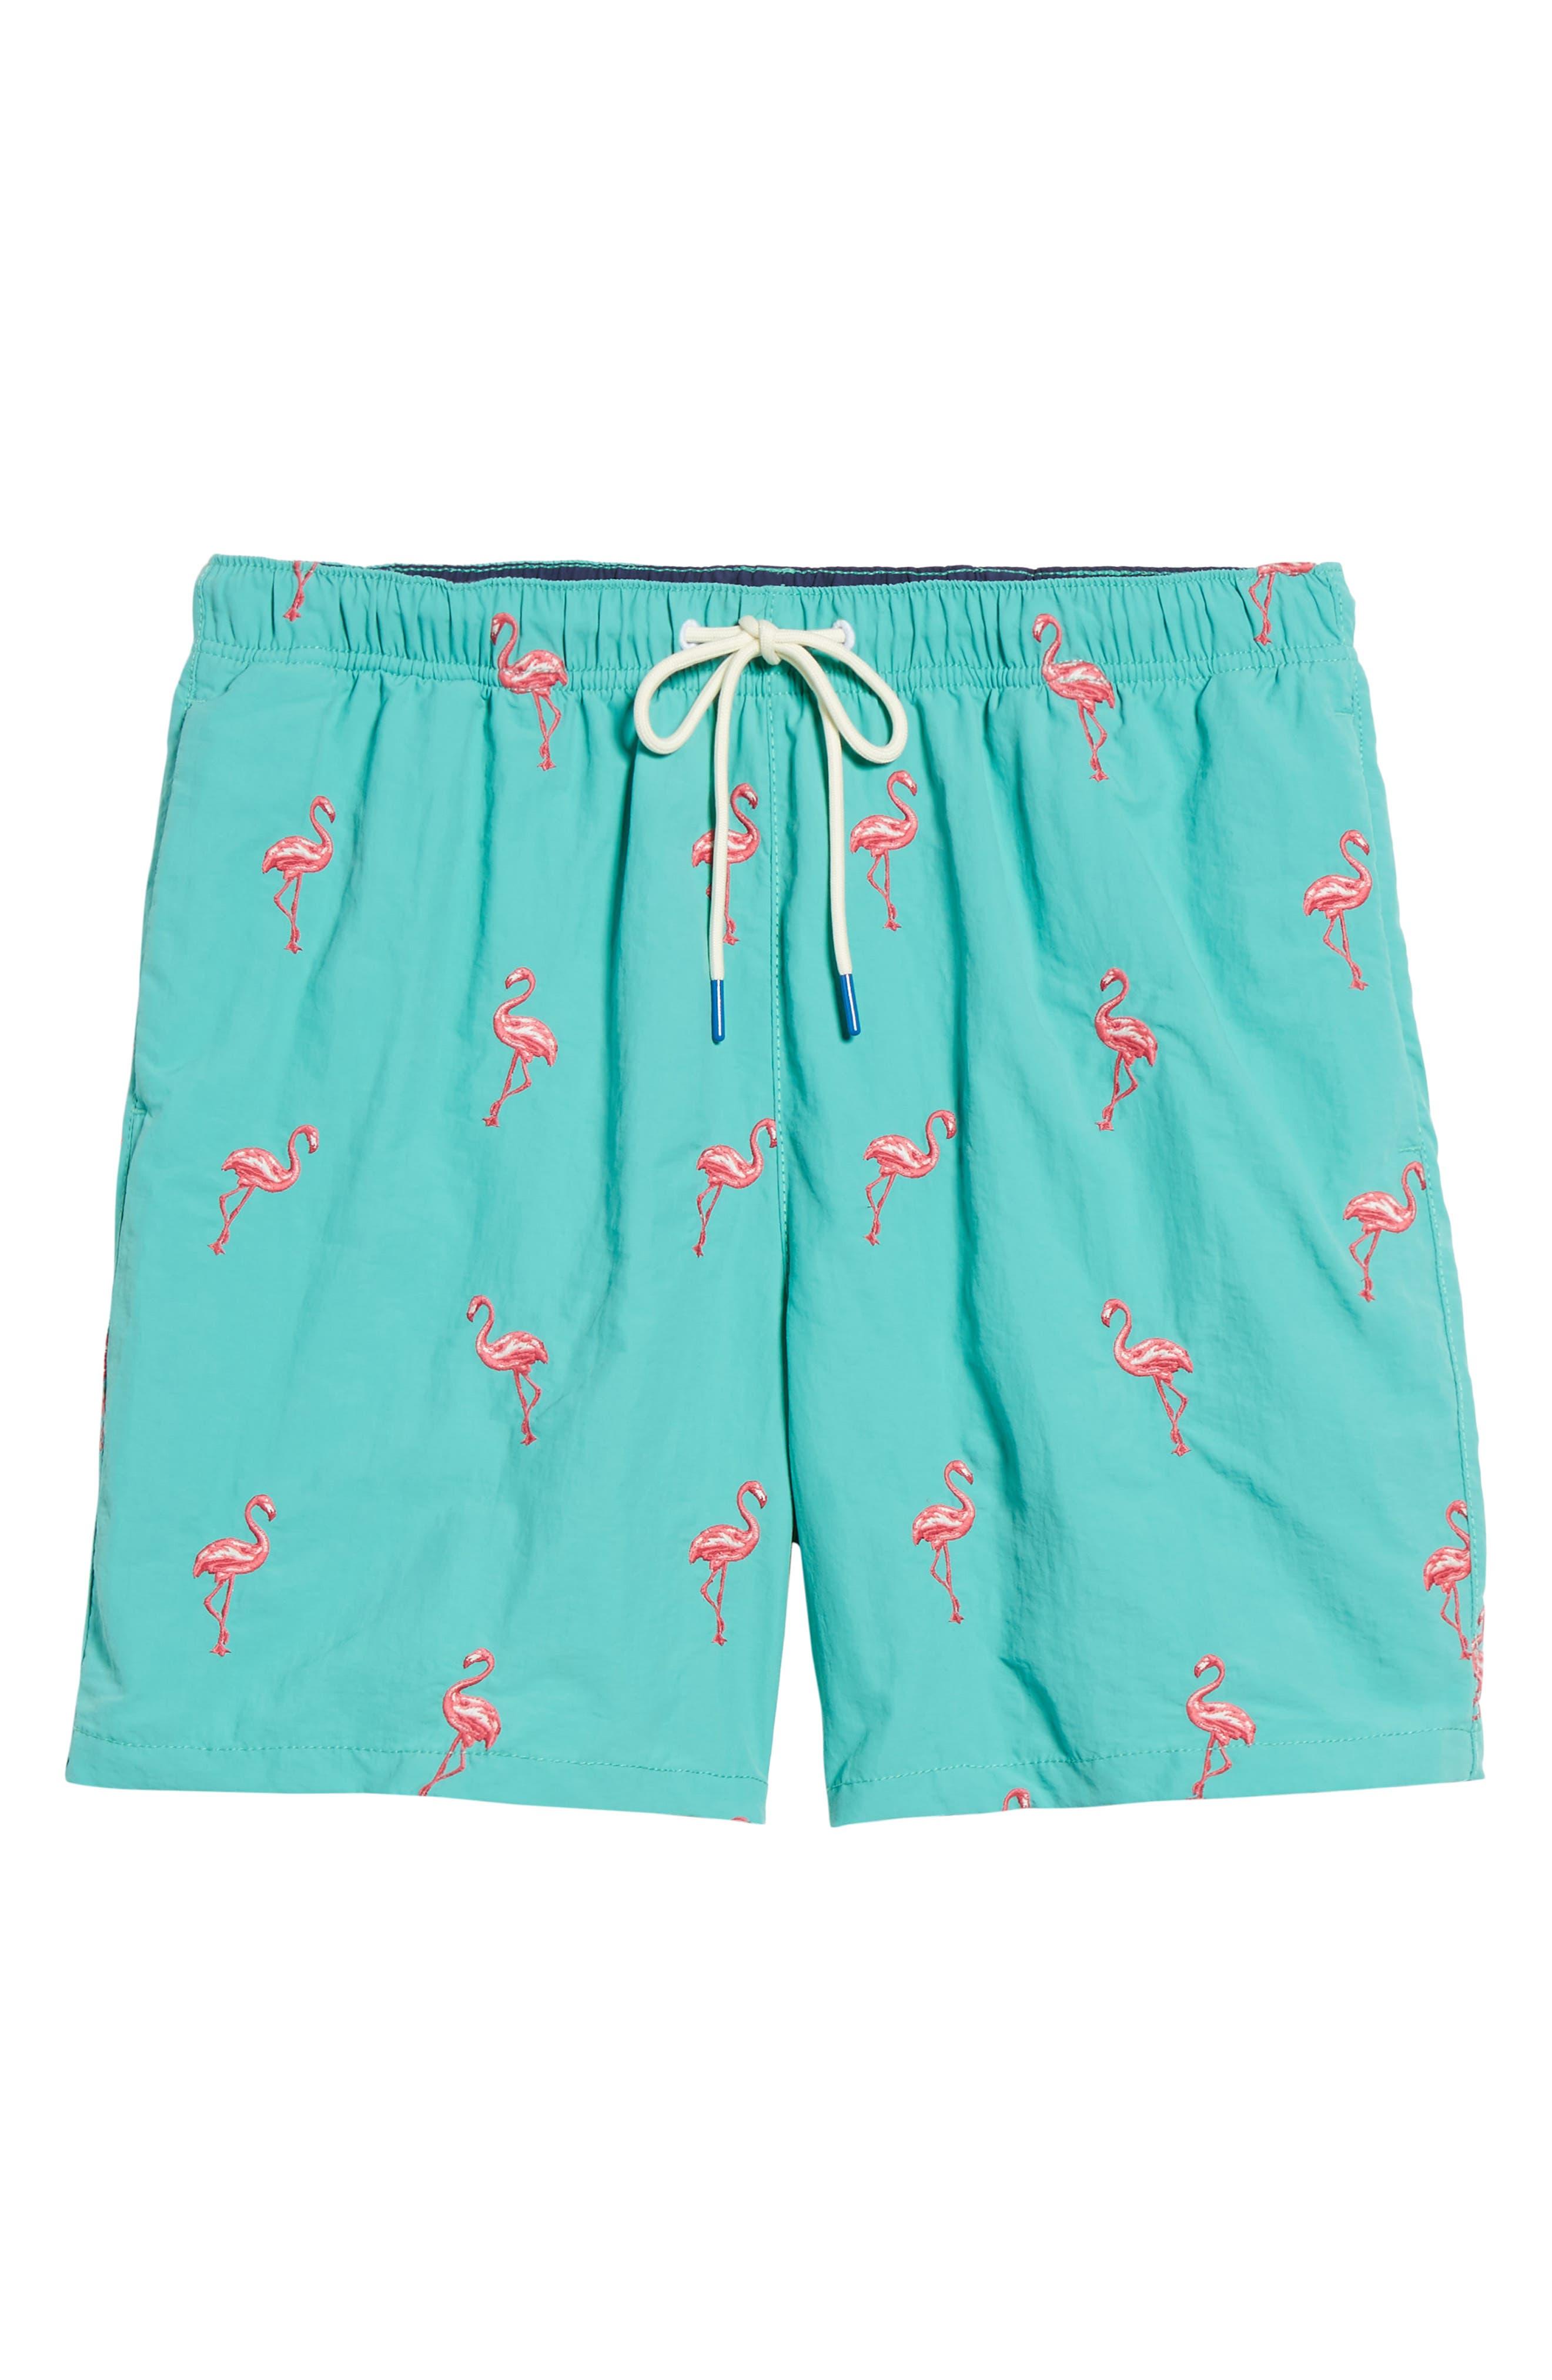 Naples Flamingo Coast Swim Trunks,                             Alternate thumbnail 6, color,                             CASTAWAY GREEN